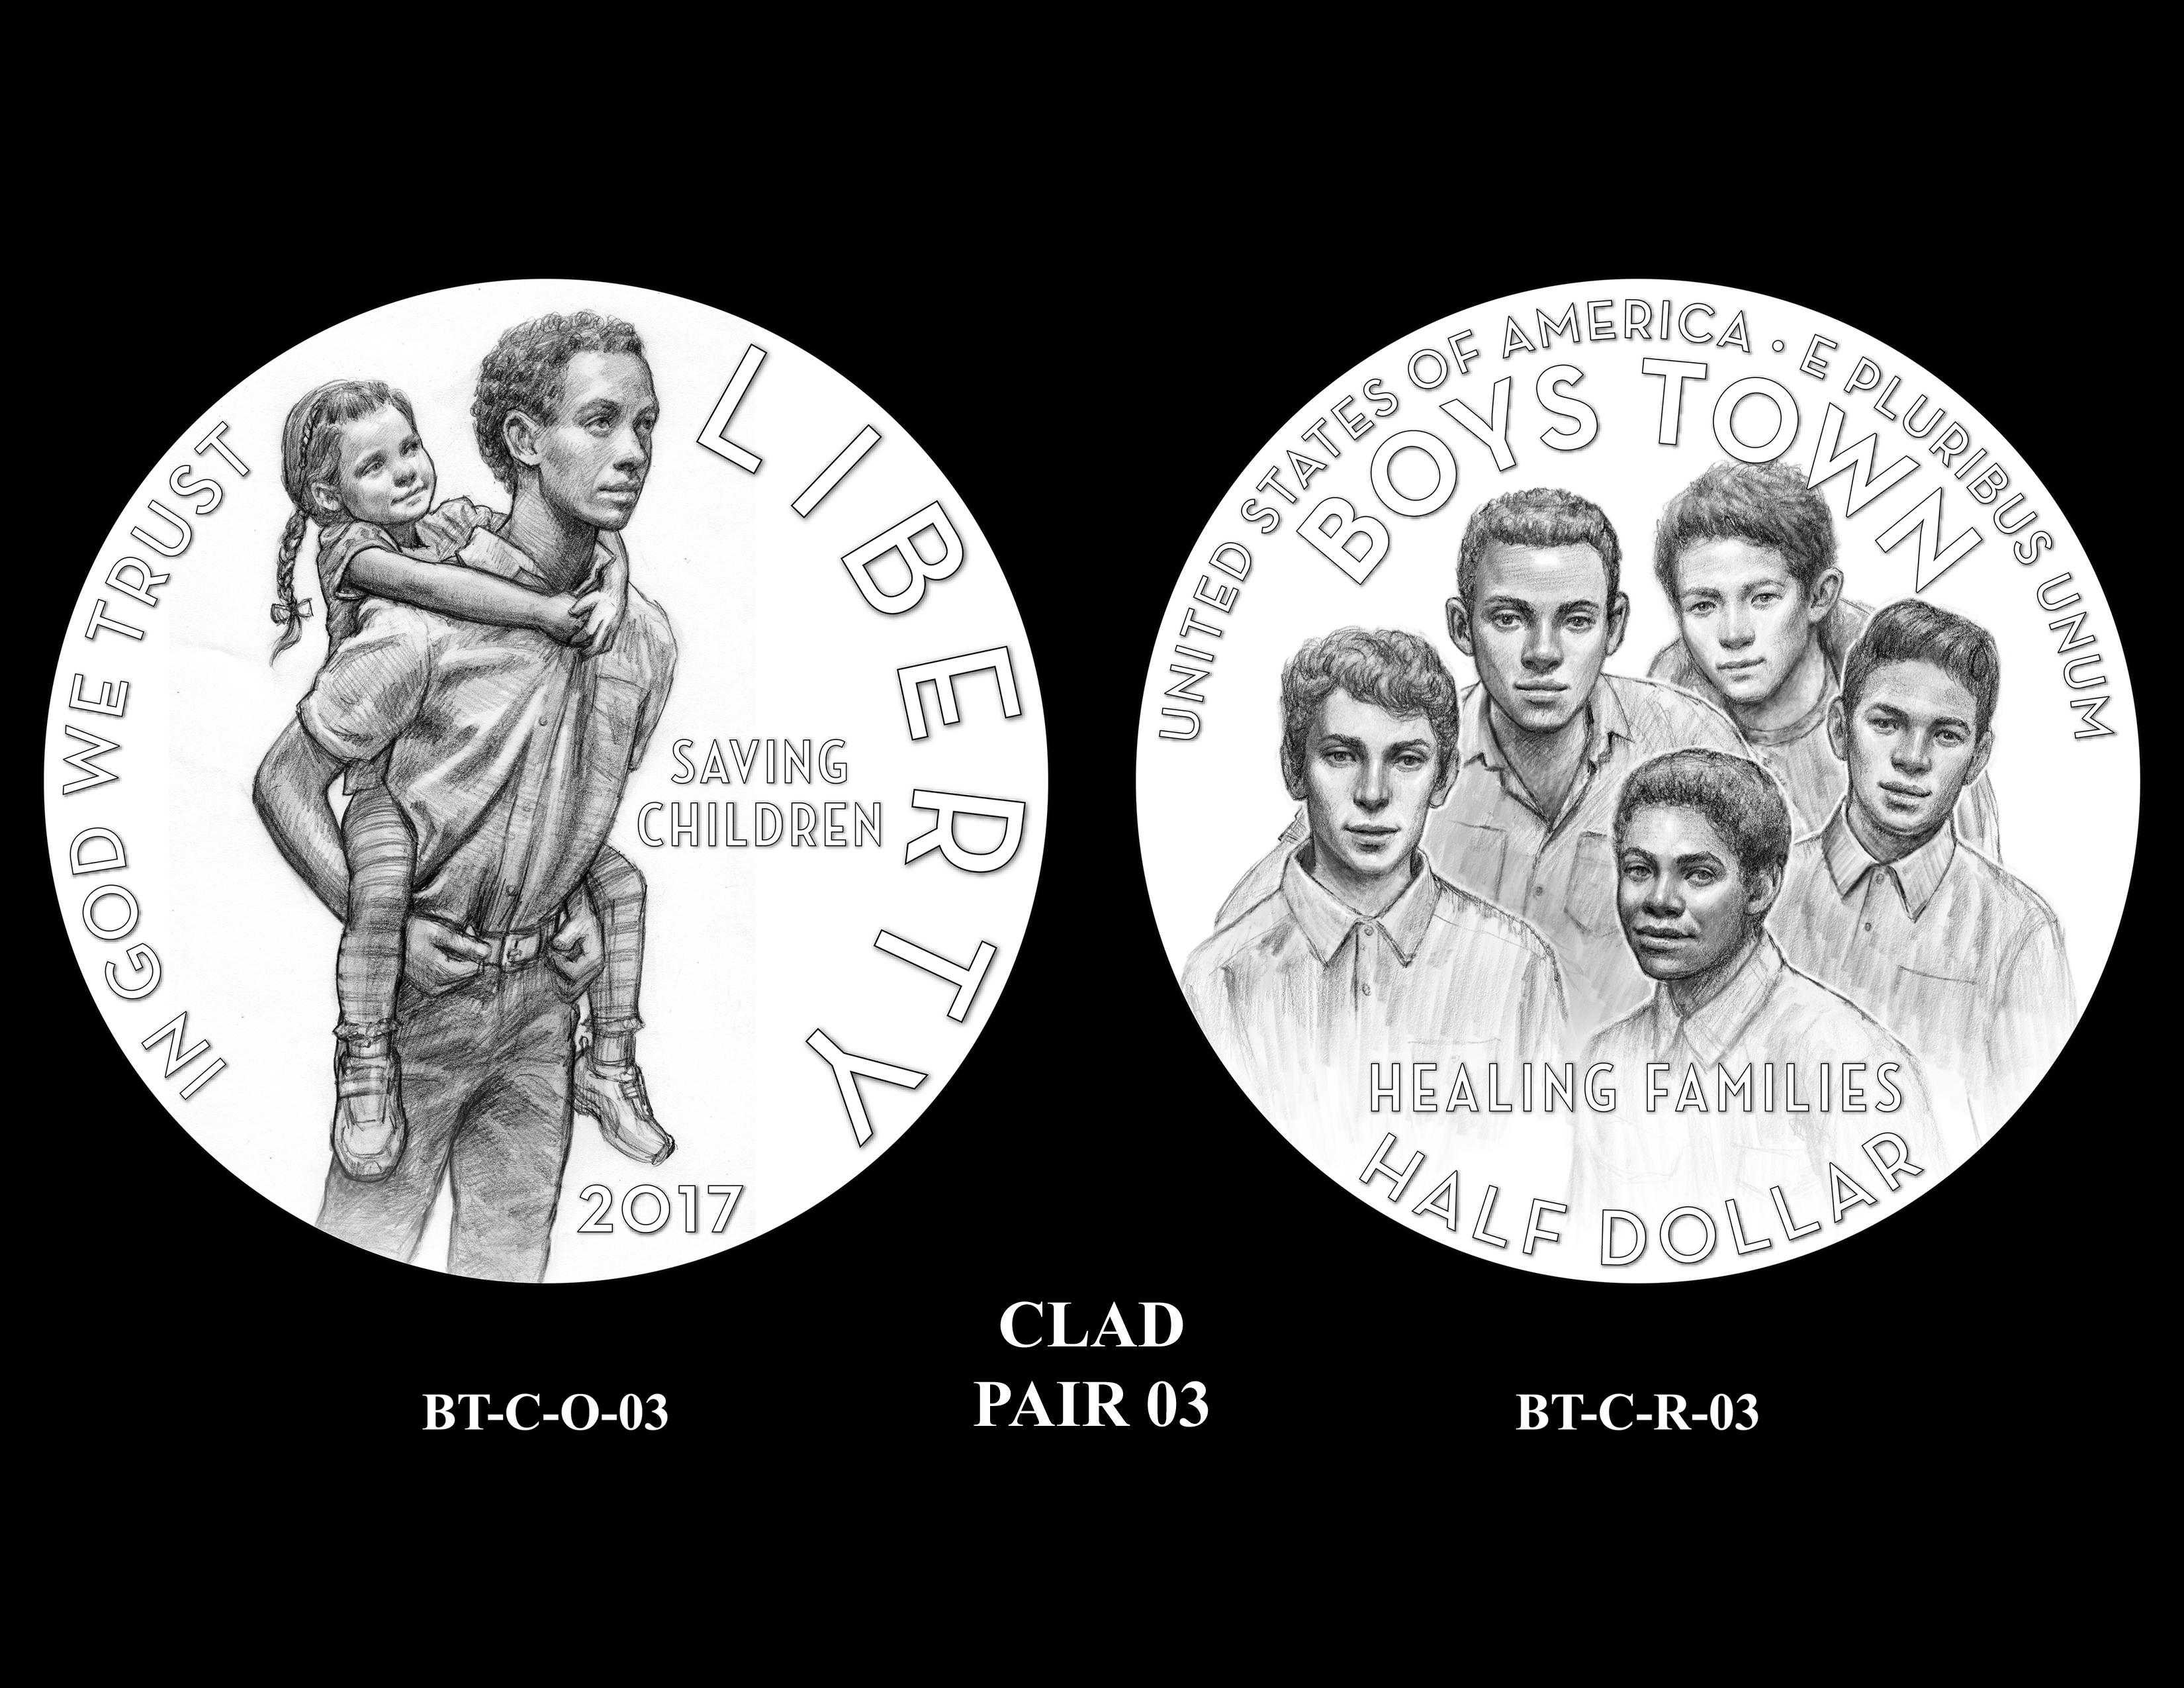 Clad-Pair-03 -- 2017 Boystown Centennial Commemorative Coin  Program